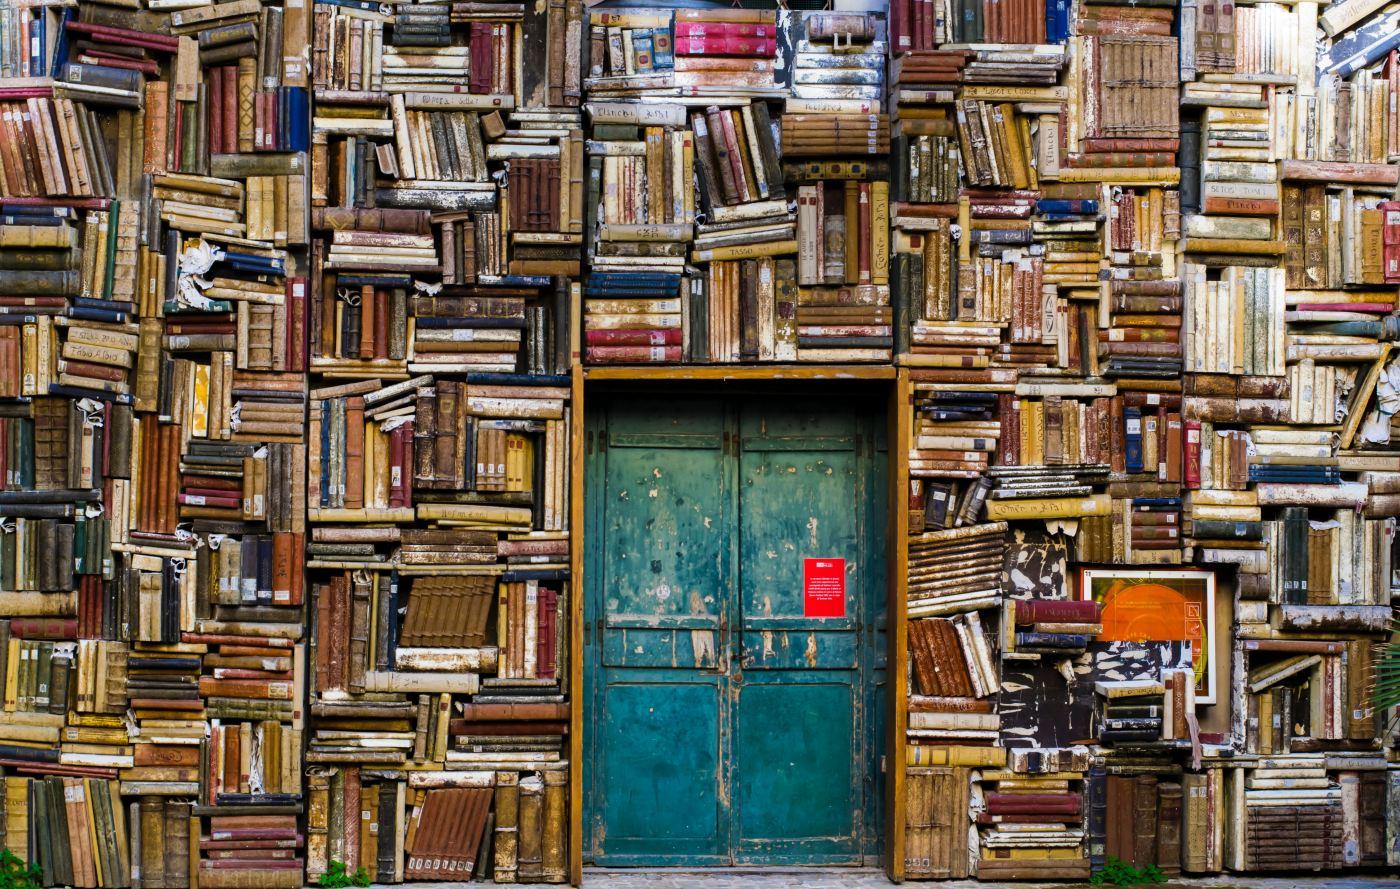 Quels sont les secrets que les livres renferment ?